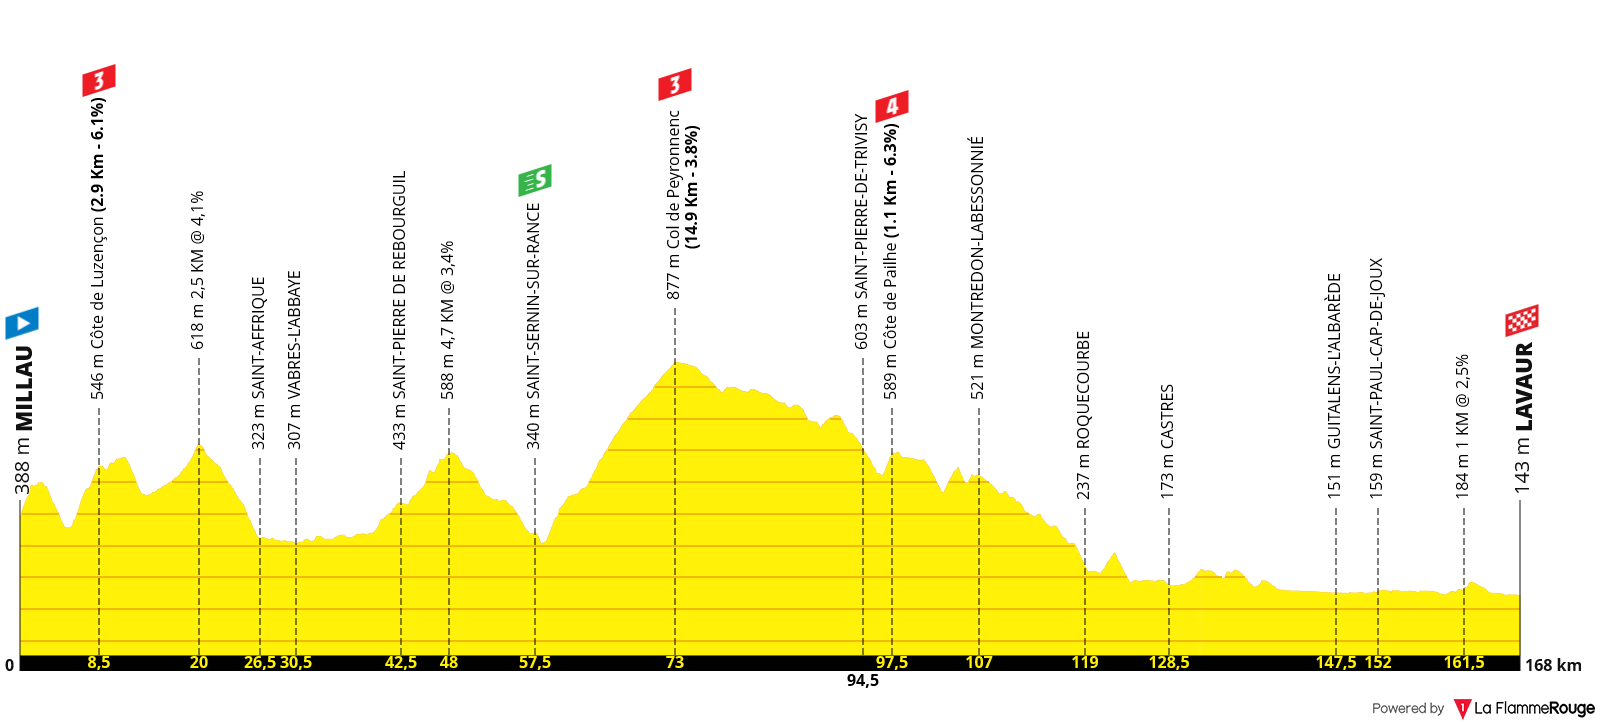 Perfil Etapa 07 - Tour de Francia 2020 - Millau > Lavaur - 168km